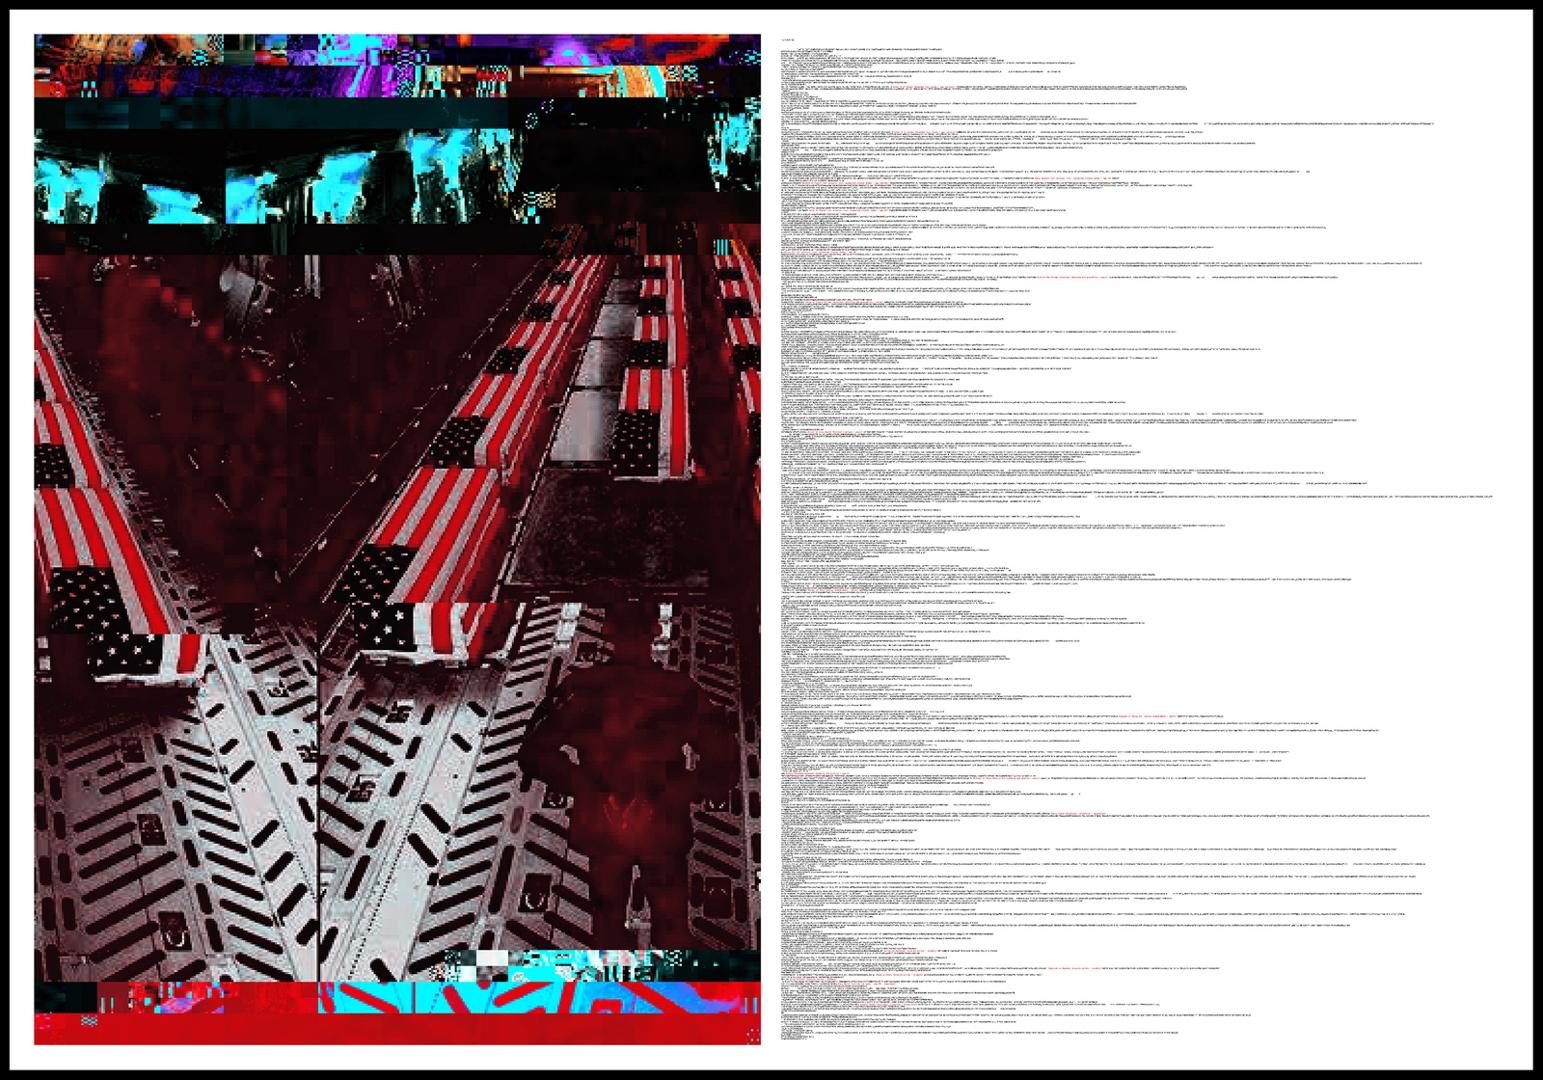 Untitled II, Embedded image